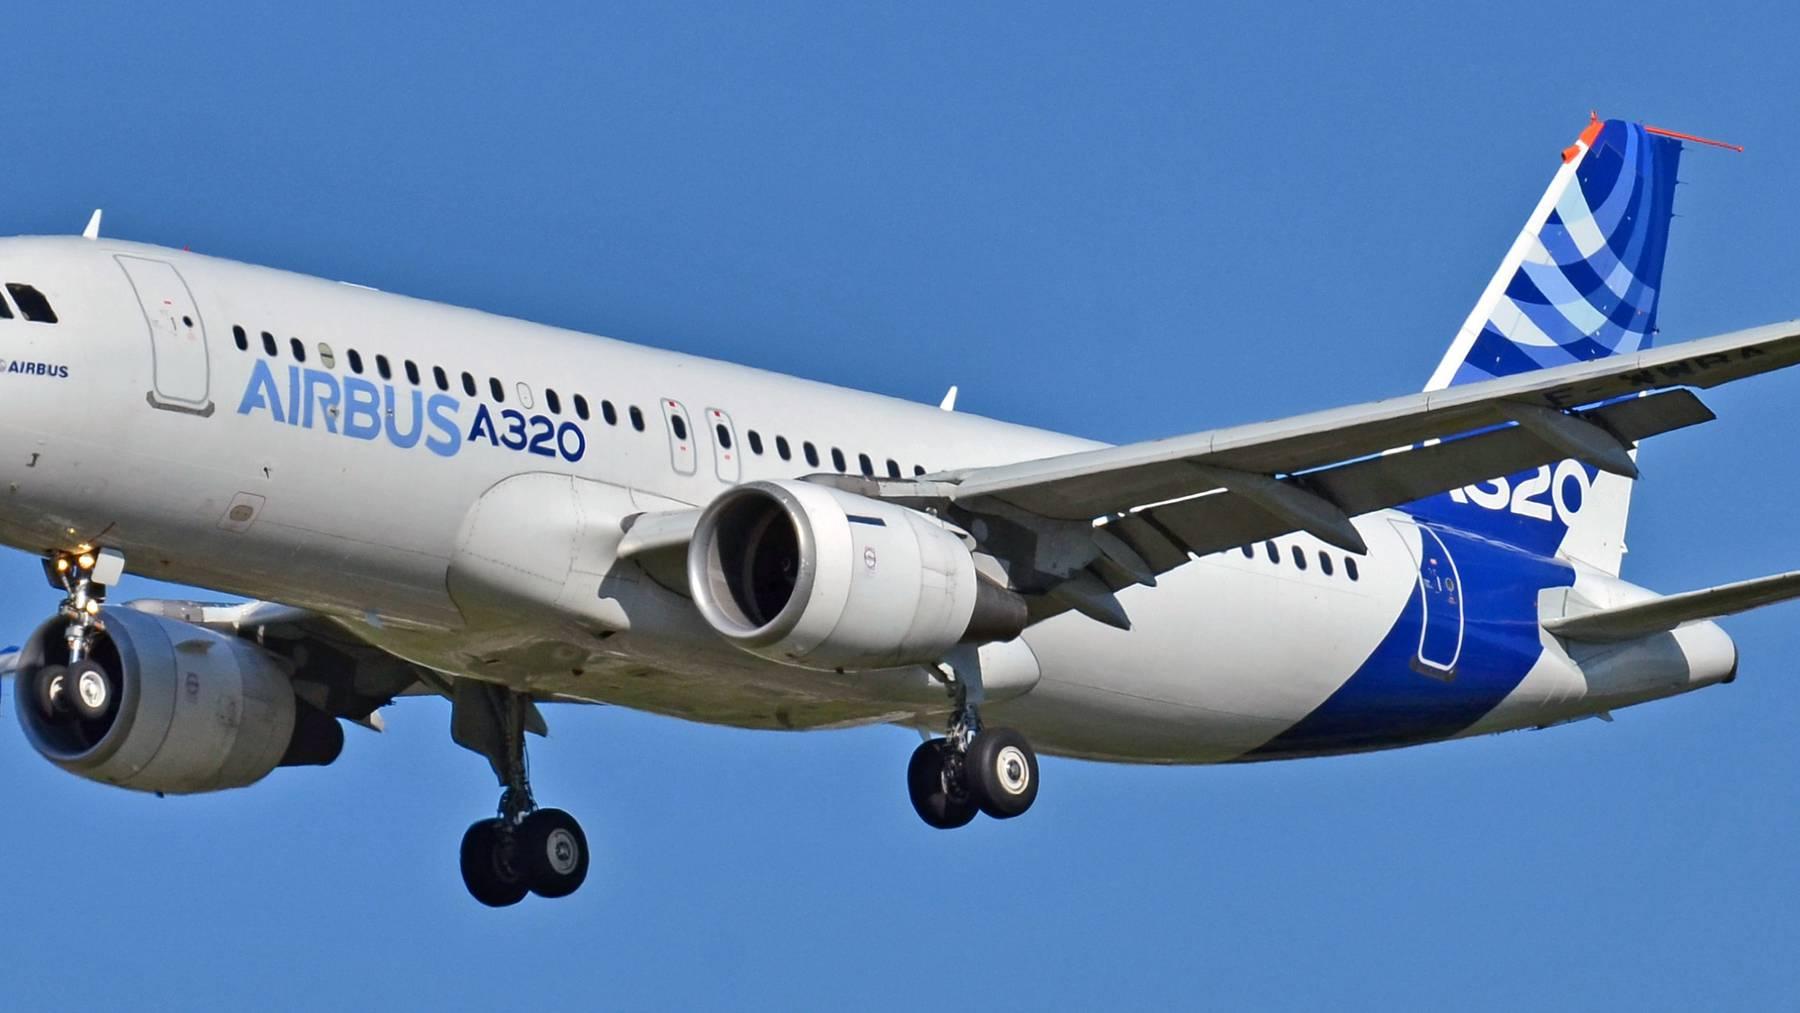 Ruag beliefert weiterhin Airbus